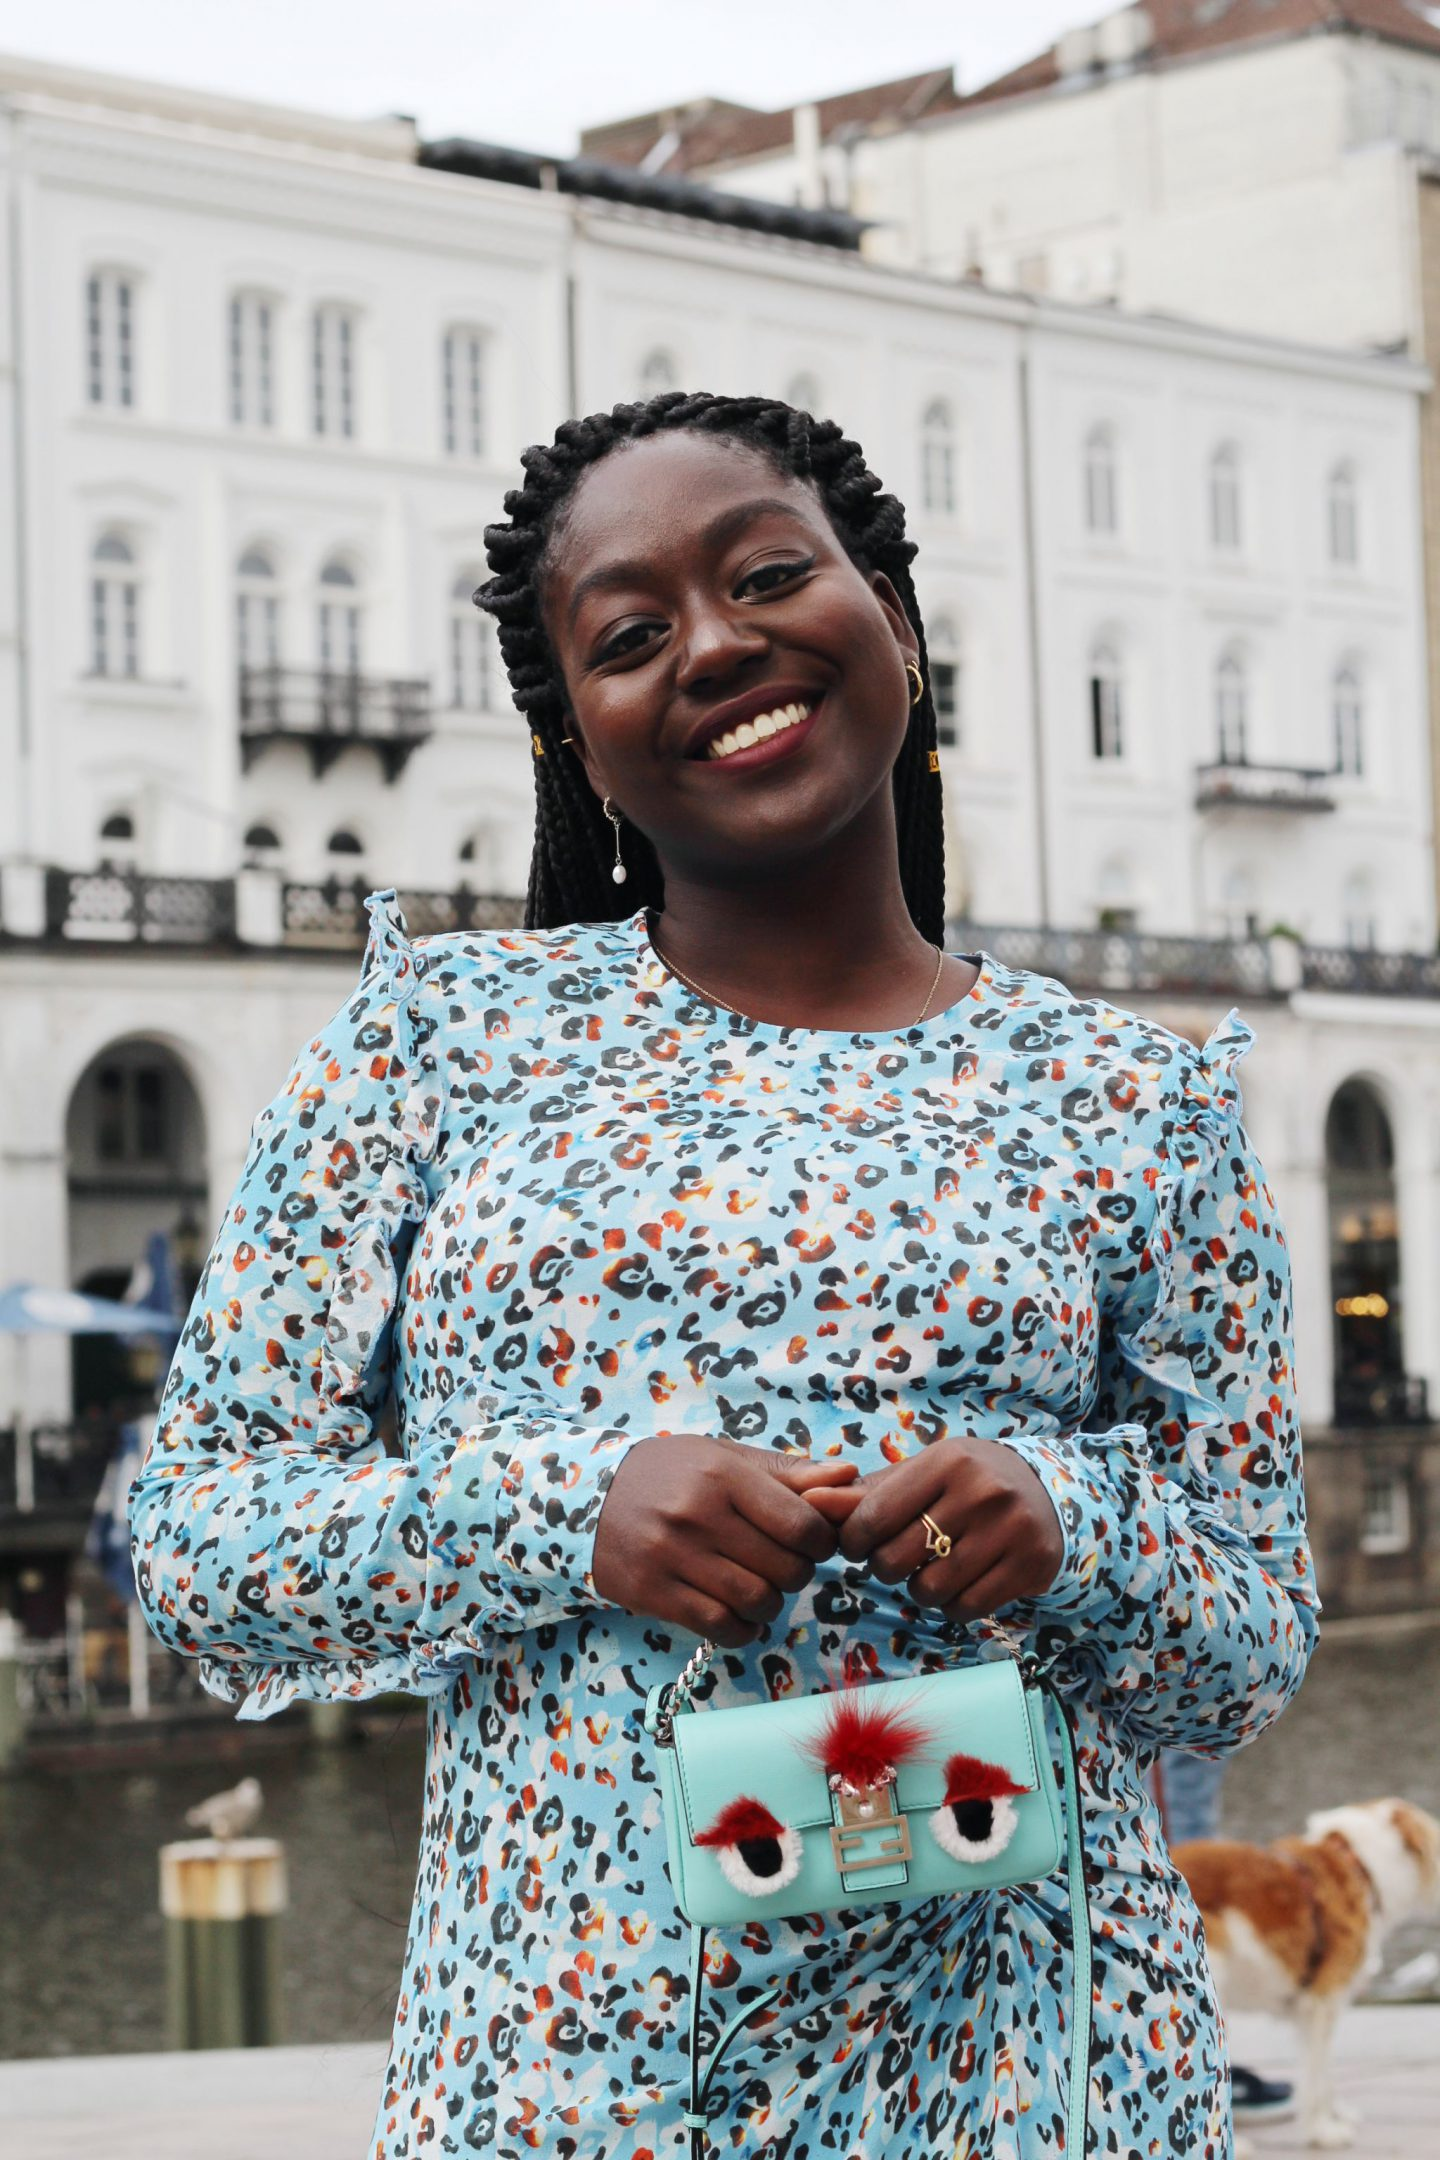 Lala_Berlin_Streetstyle_Lois_Opoku_Fashion_Blogger_Fendi_Monster_lisforlois_5